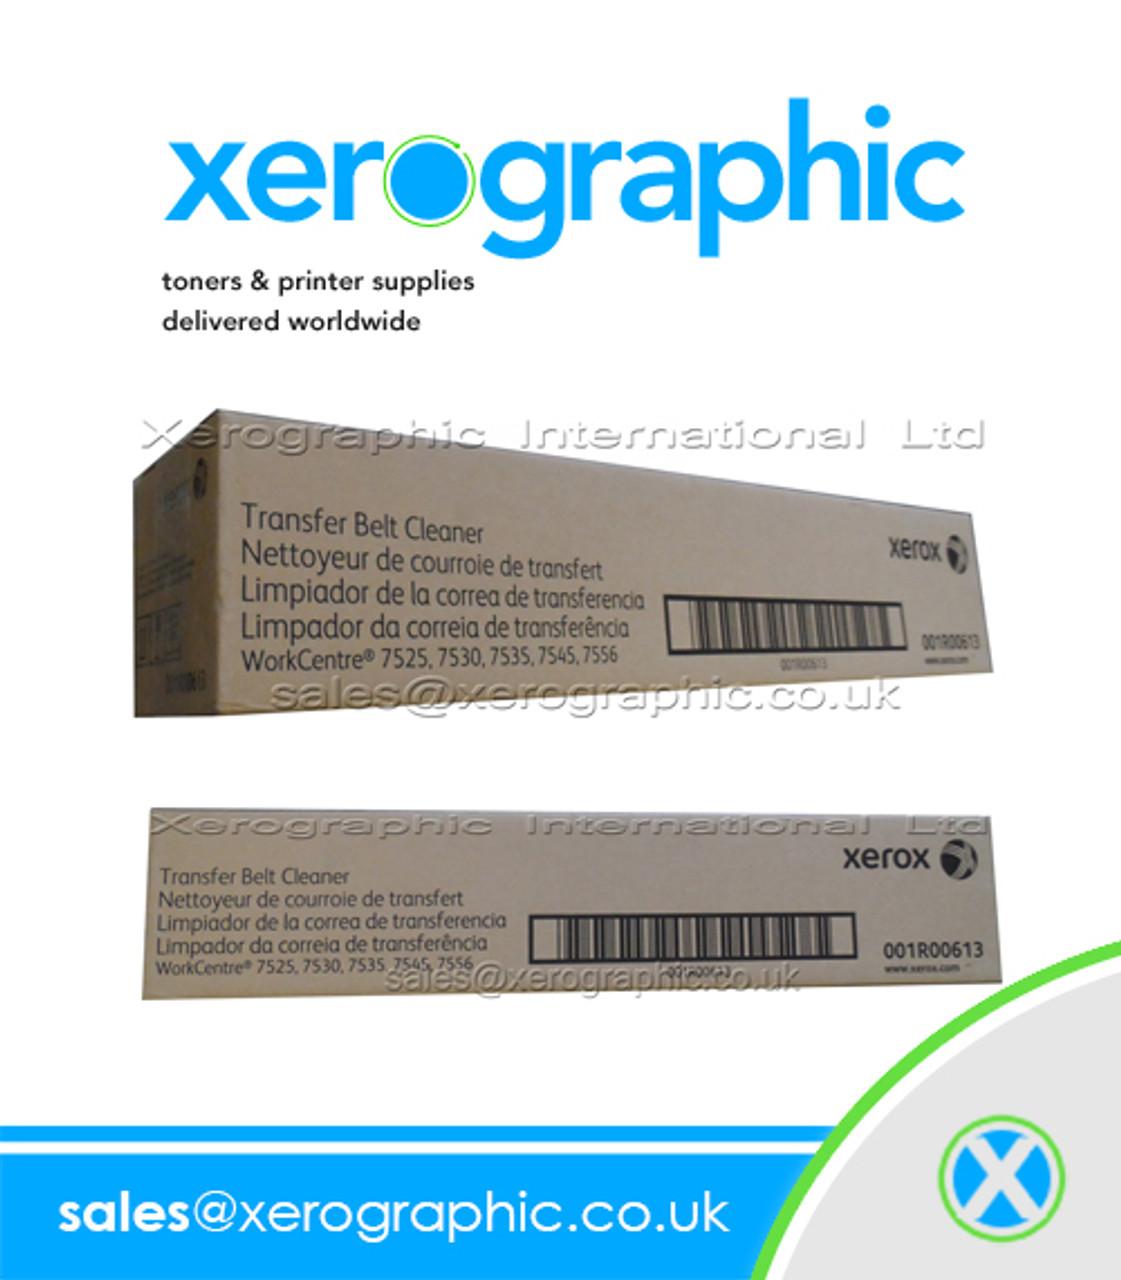 7835 7545 7535 7556 Xerox 001R00613 Transfer Belt Cleaner 7525 7530 7830